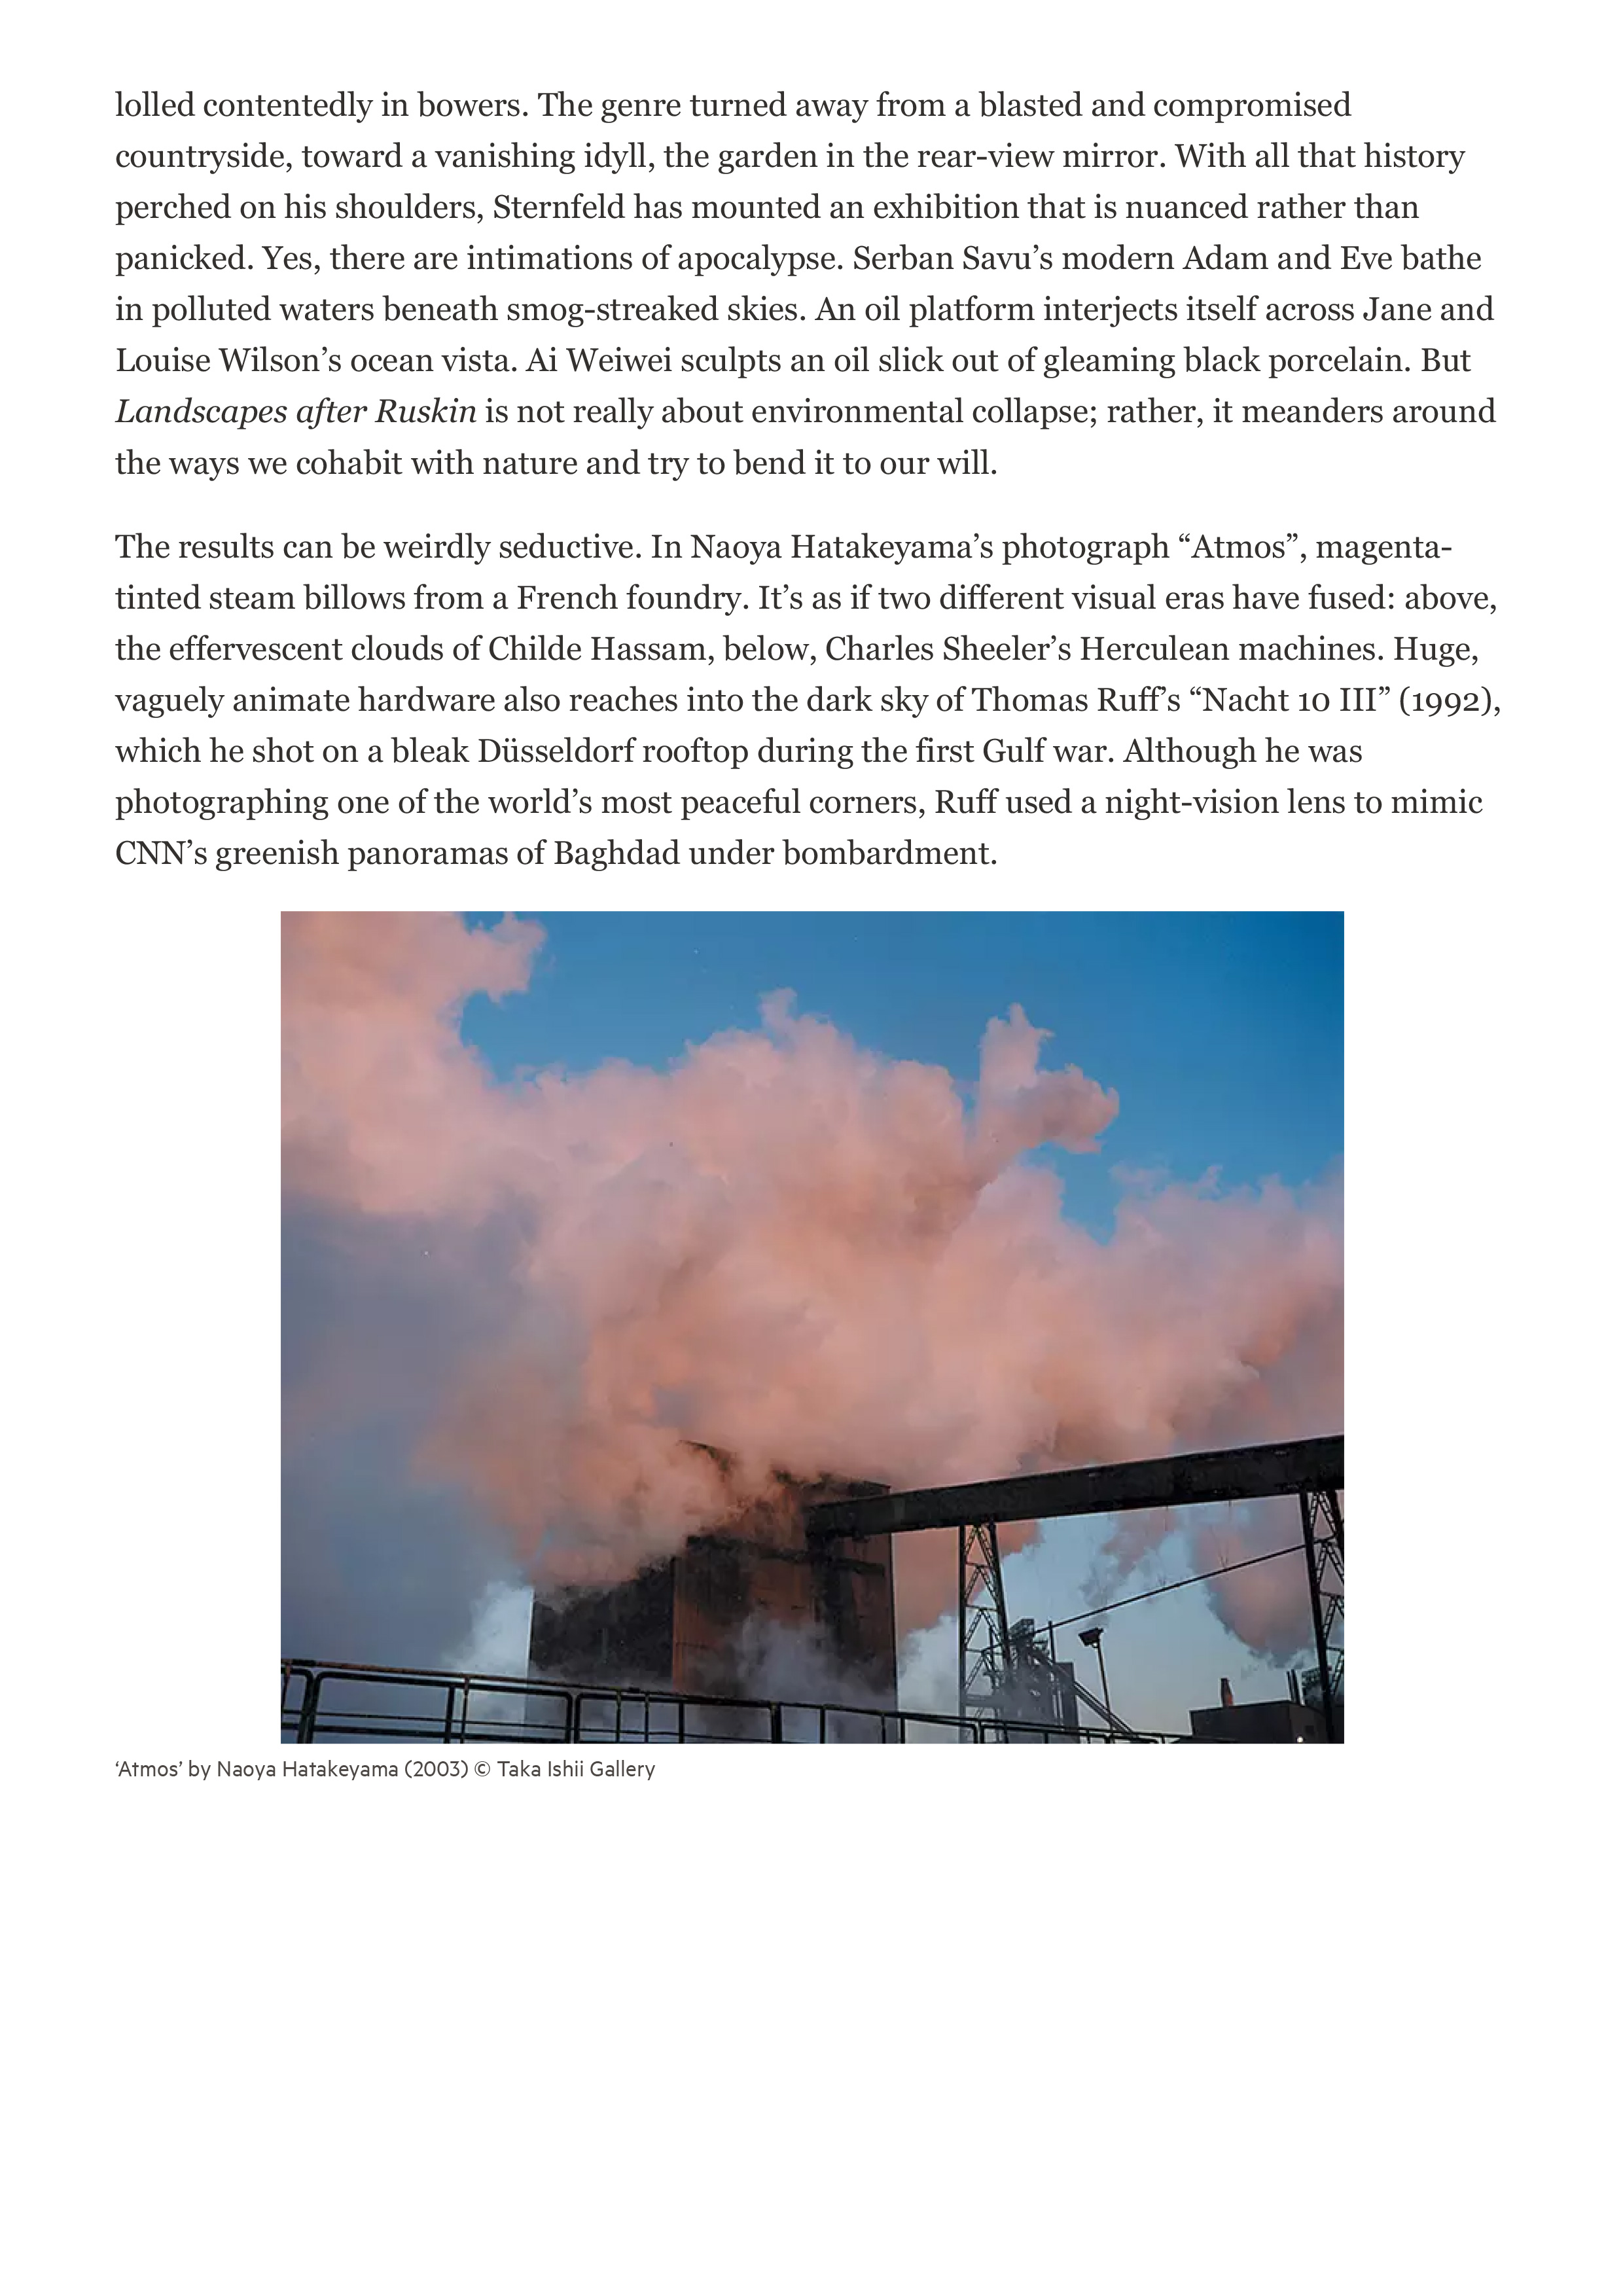 Landscapes-After-Ruskin,-Grey-Art-Gallery,-New-York-—-'distressingly-enchanting'-3.jpg